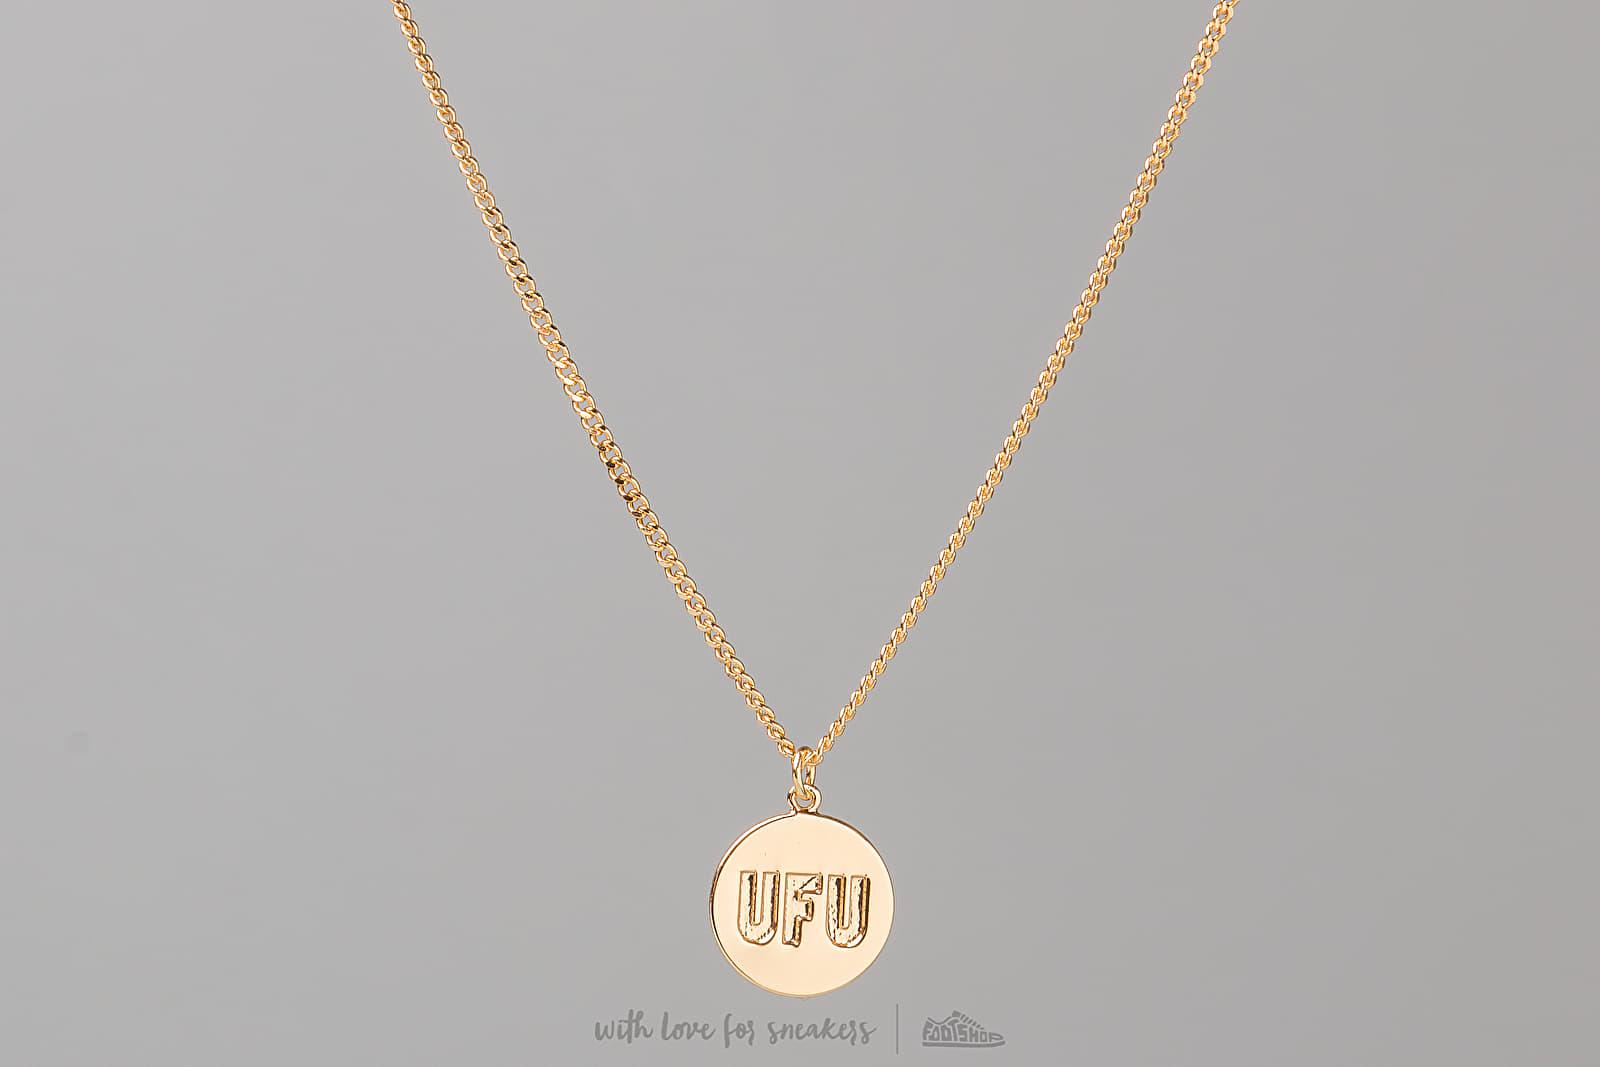 Used Future Universal Circle Necklace Gold za skvelú cenu 62 € kúpite na Footshop.sk